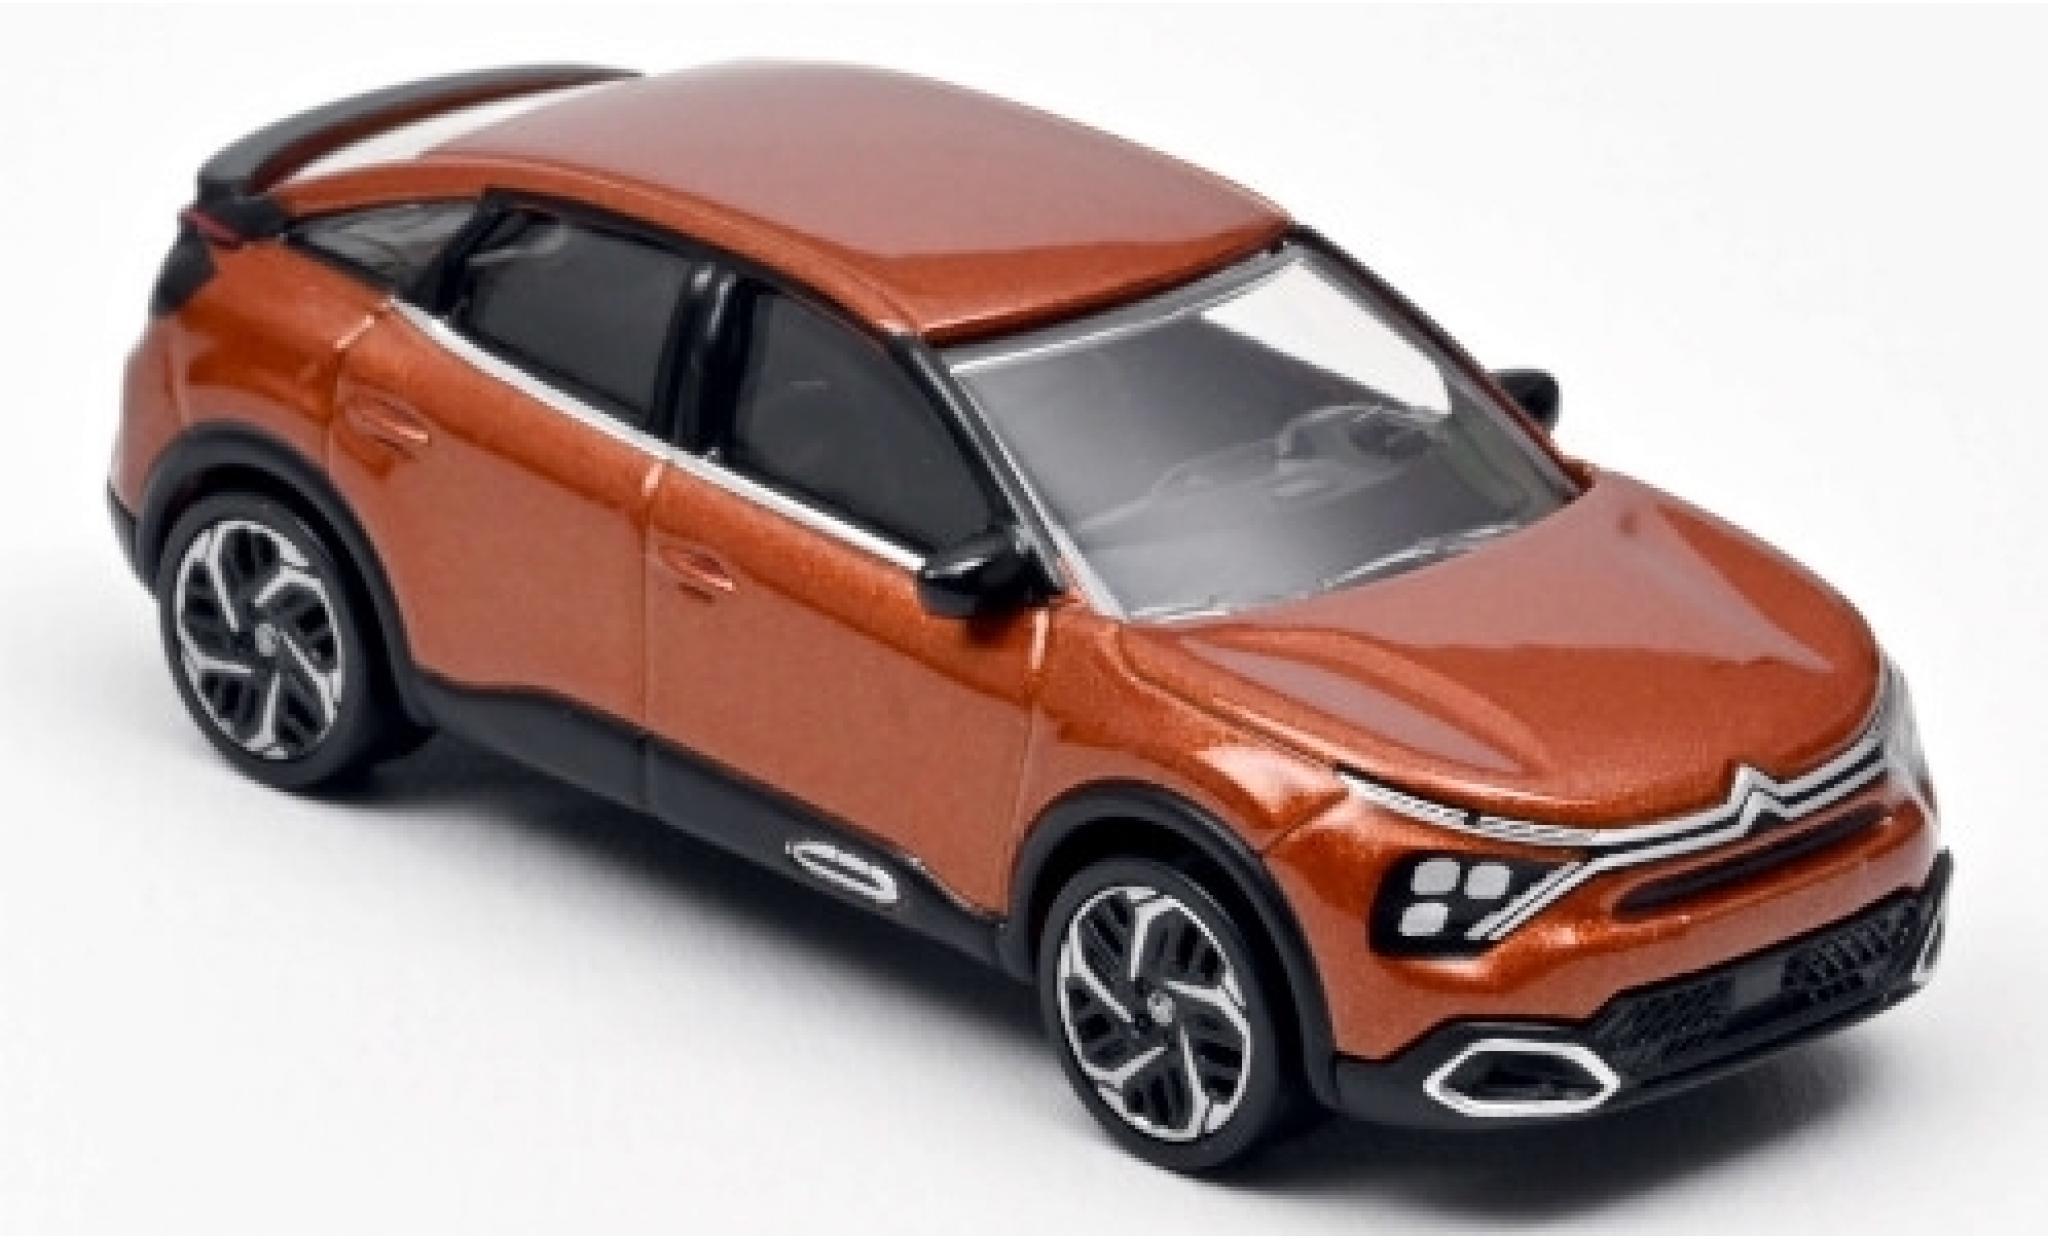 Citroen C4 1/43 Norev metallise orange 2020